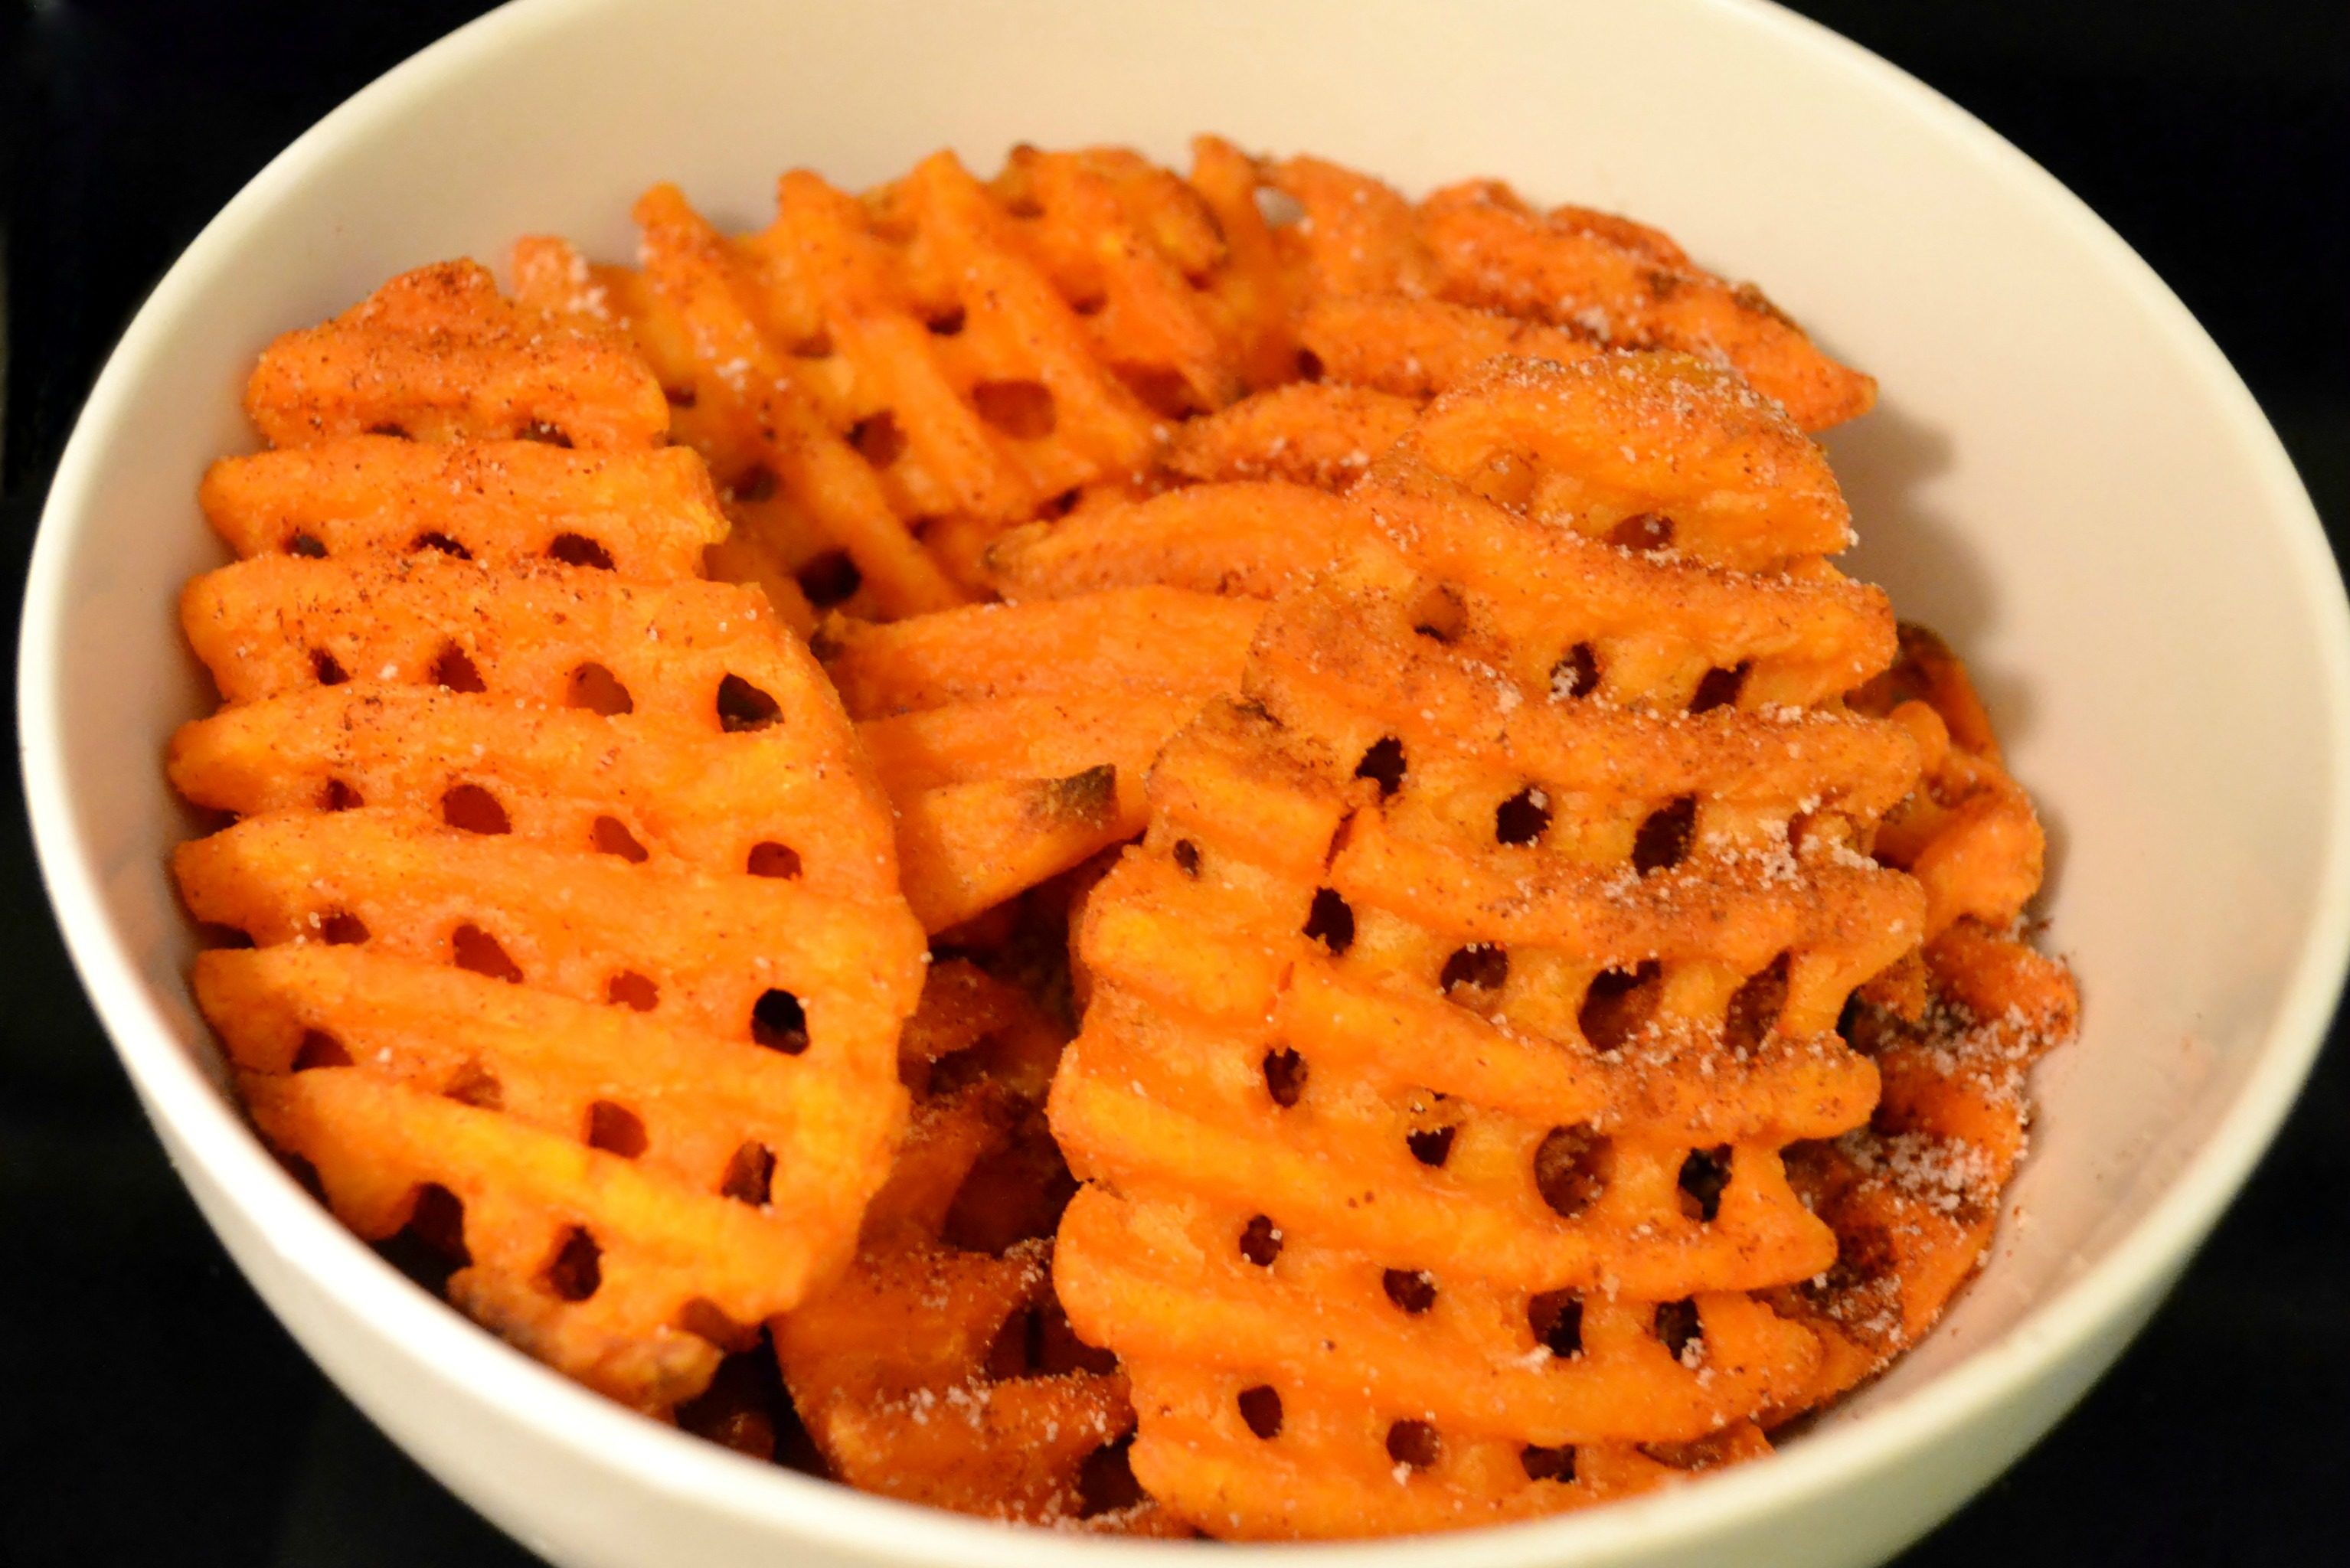 McCain Sweet Potato Waffle Fries